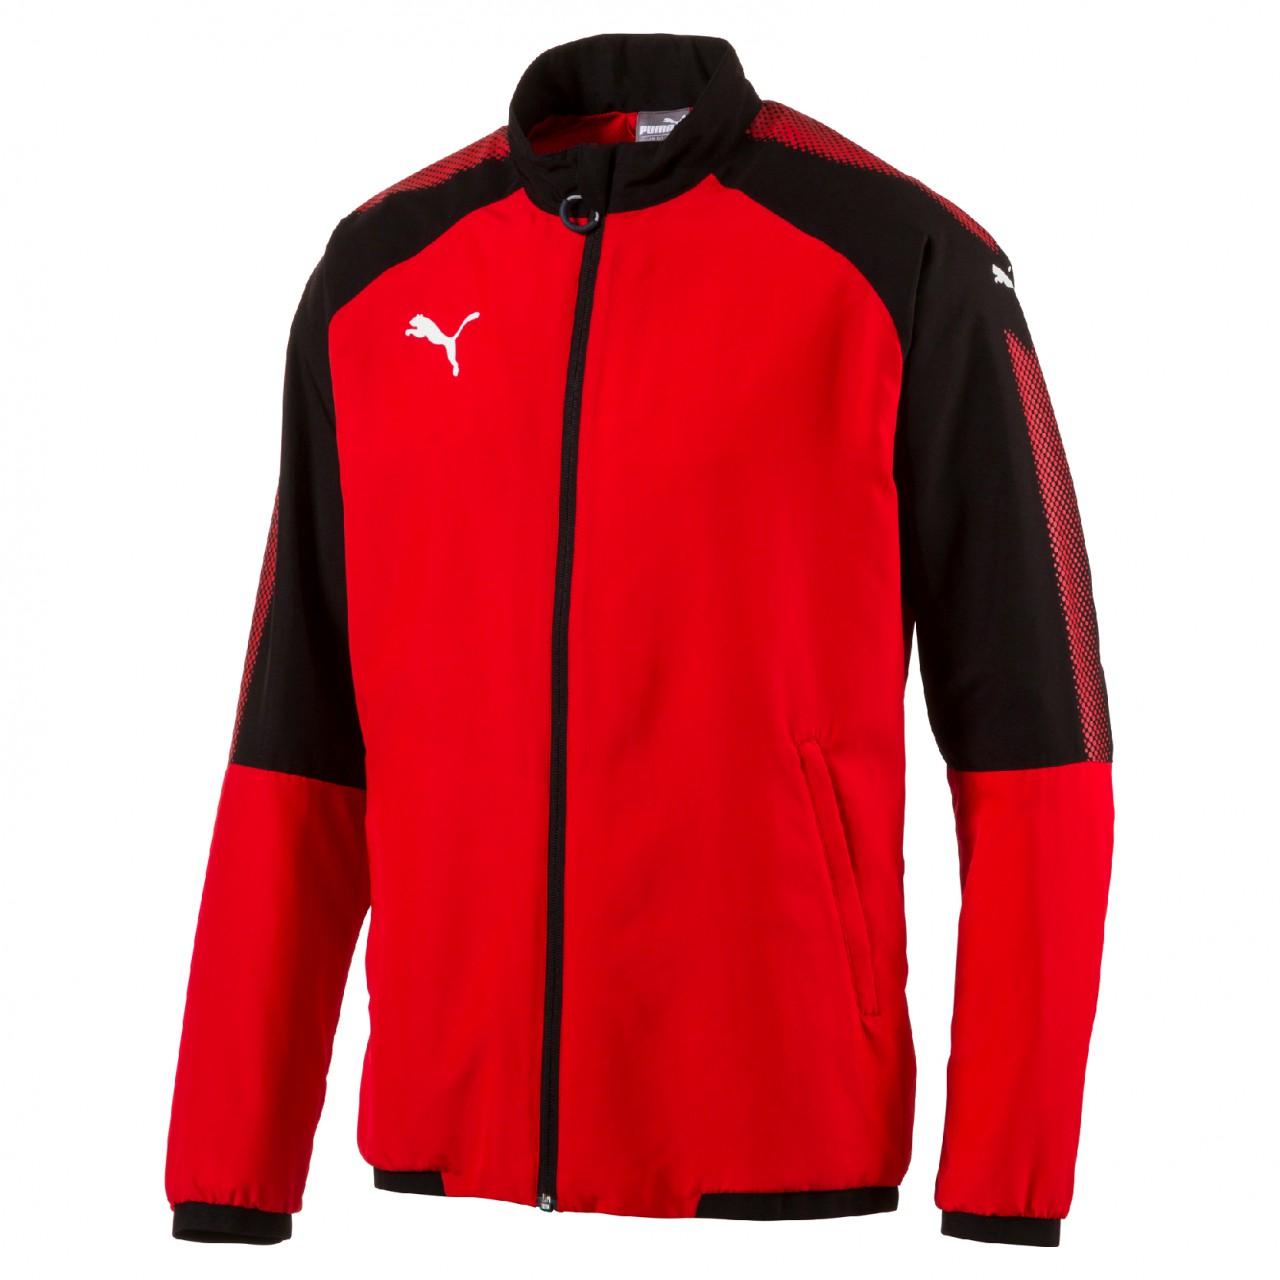 PUMA Ascension Woven Jacket